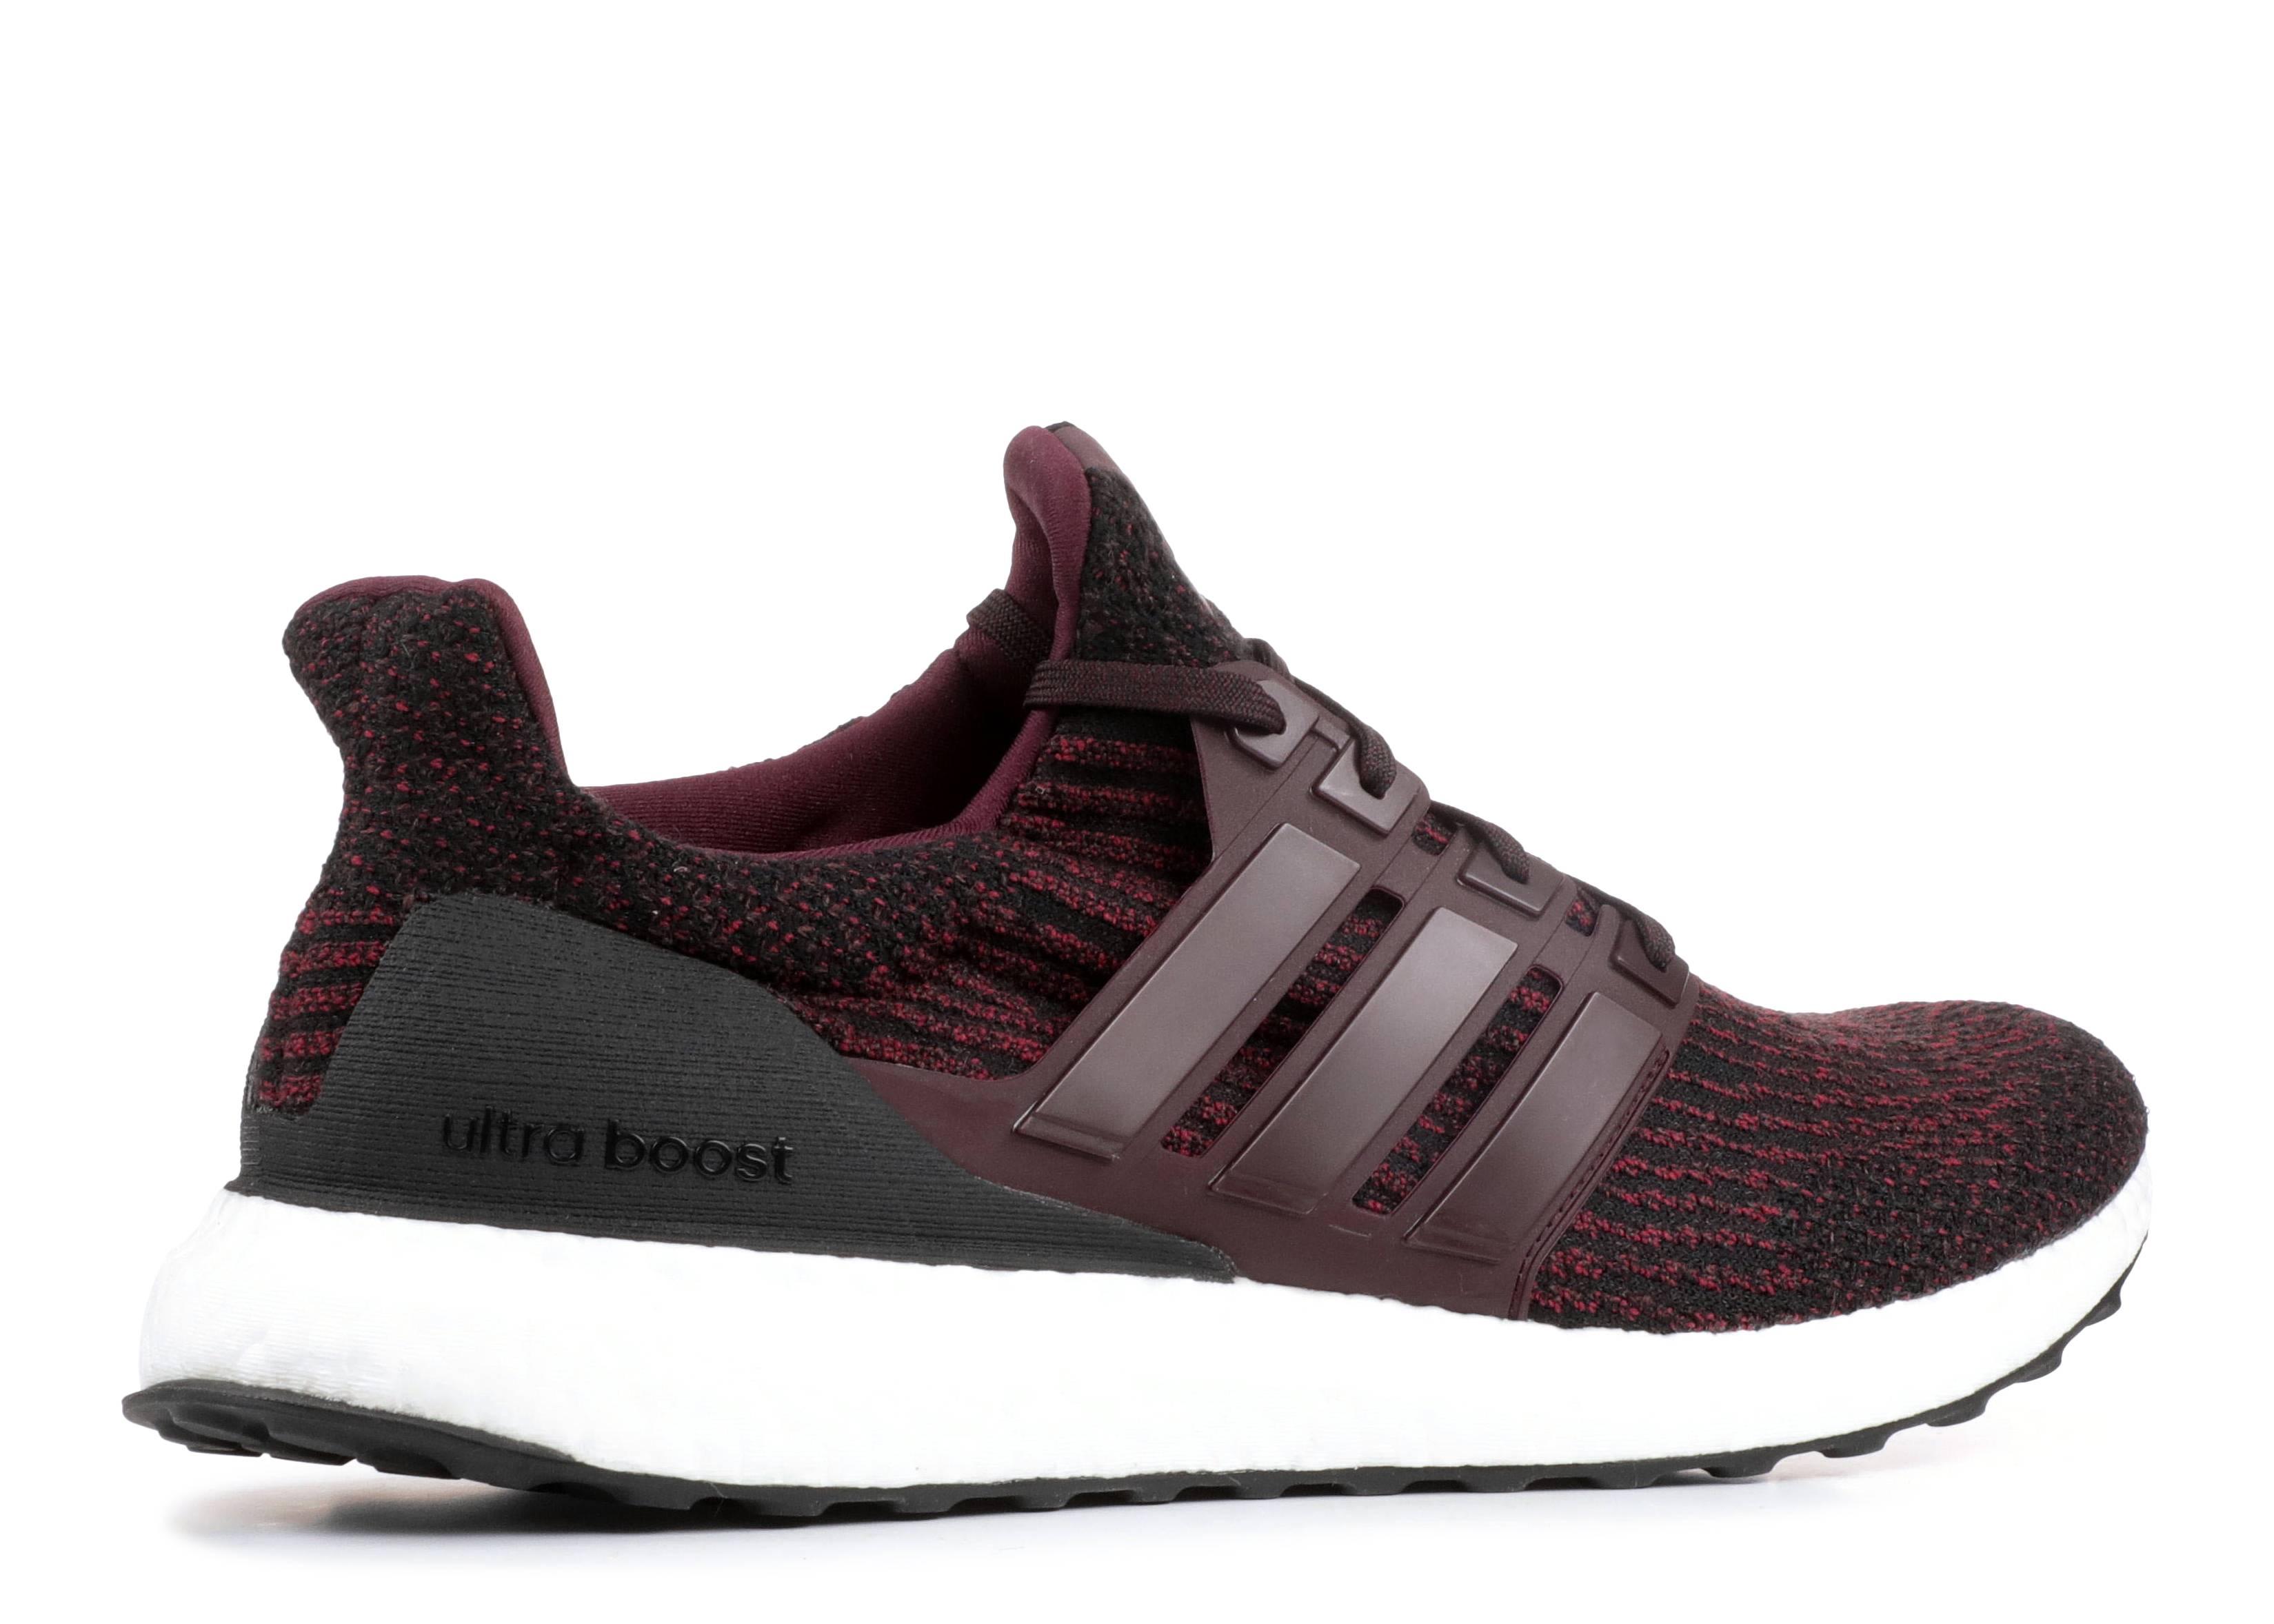 70fbf9e8ae4e Ultra Boost - Adidas - s80732 - burgandy black